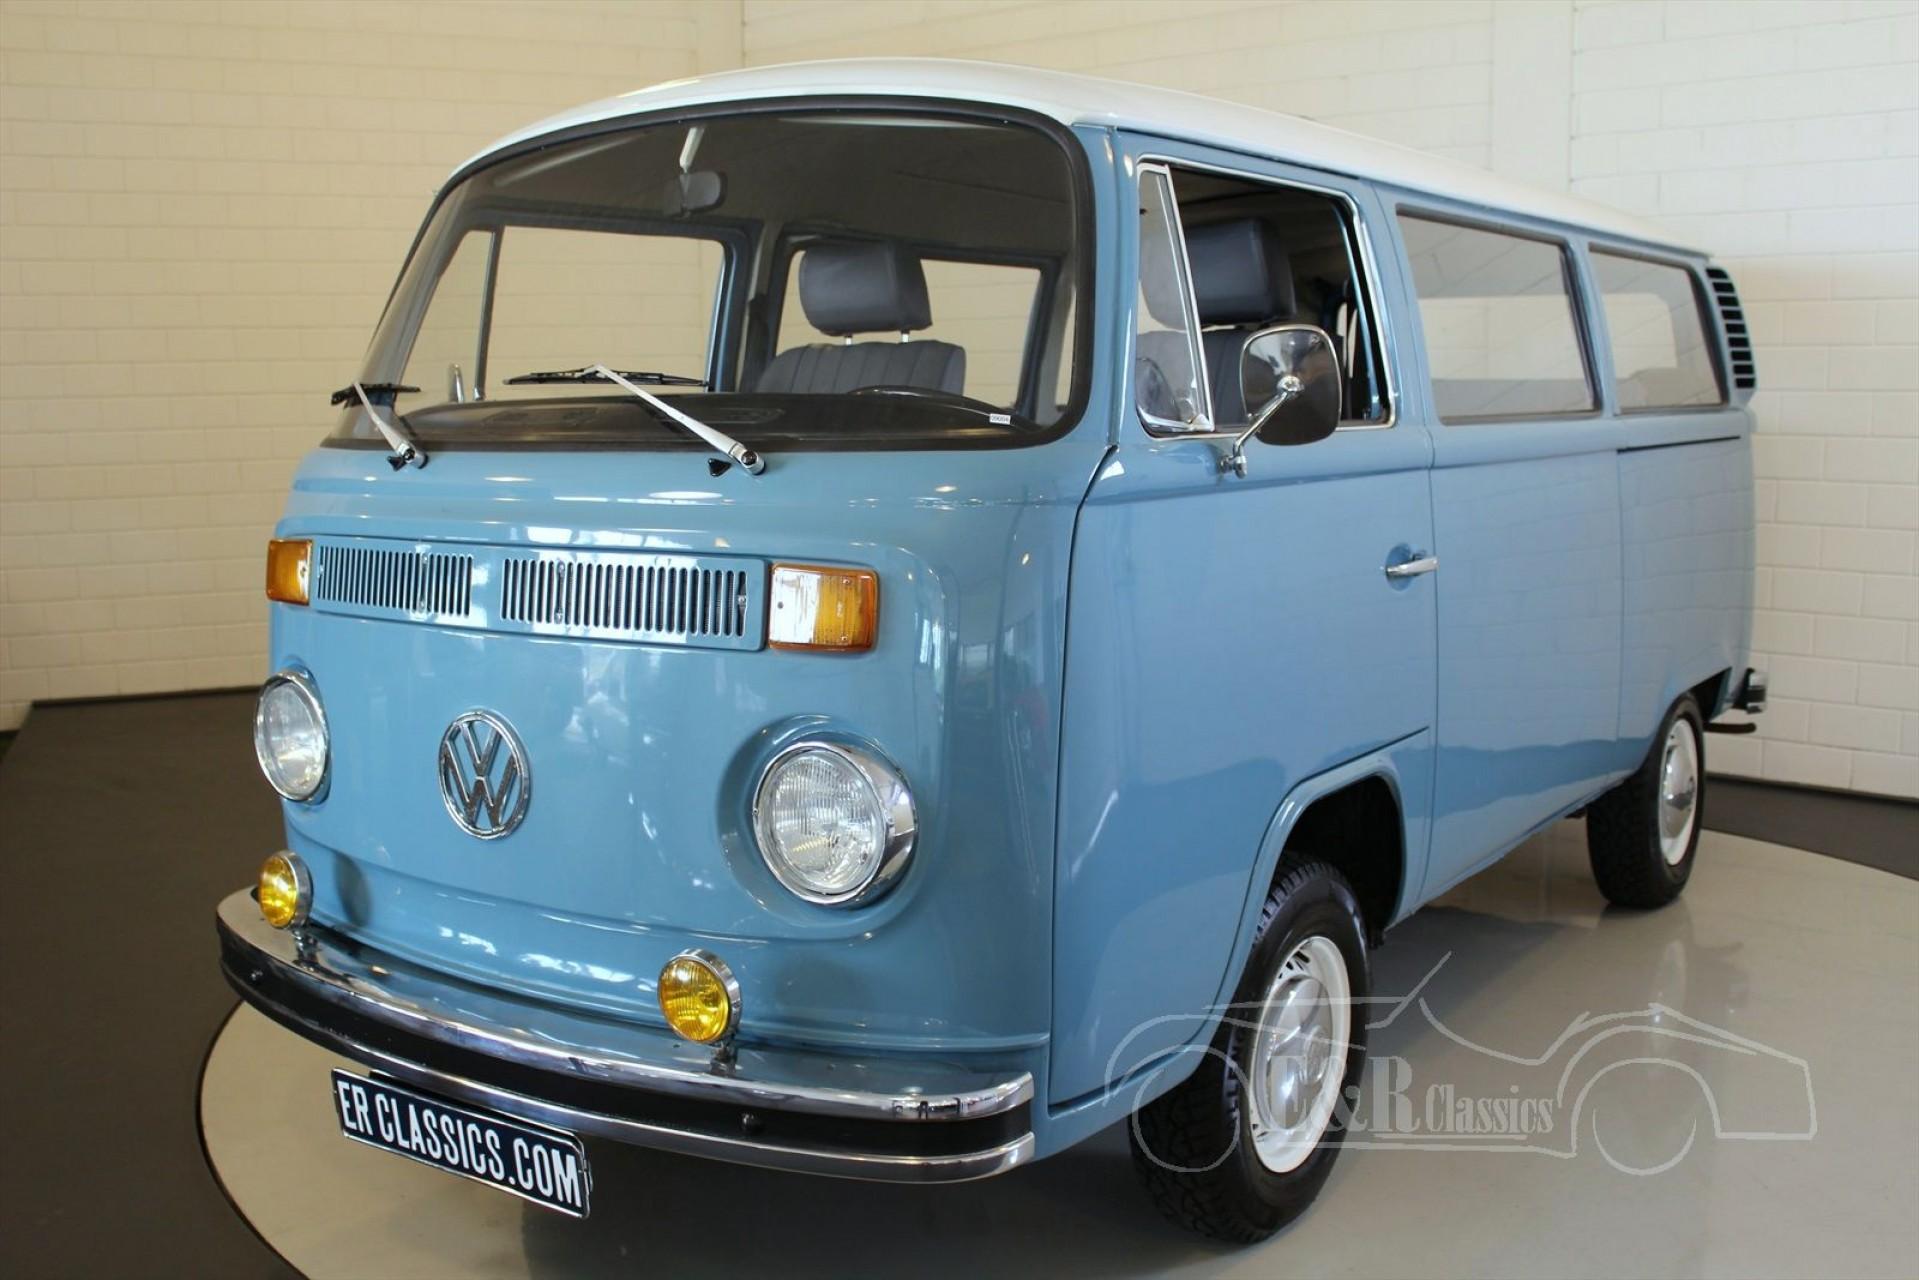 volkswagen t2 combi 1976 for sale at erclassics. Black Bedroom Furniture Sets. Home Design Ideas